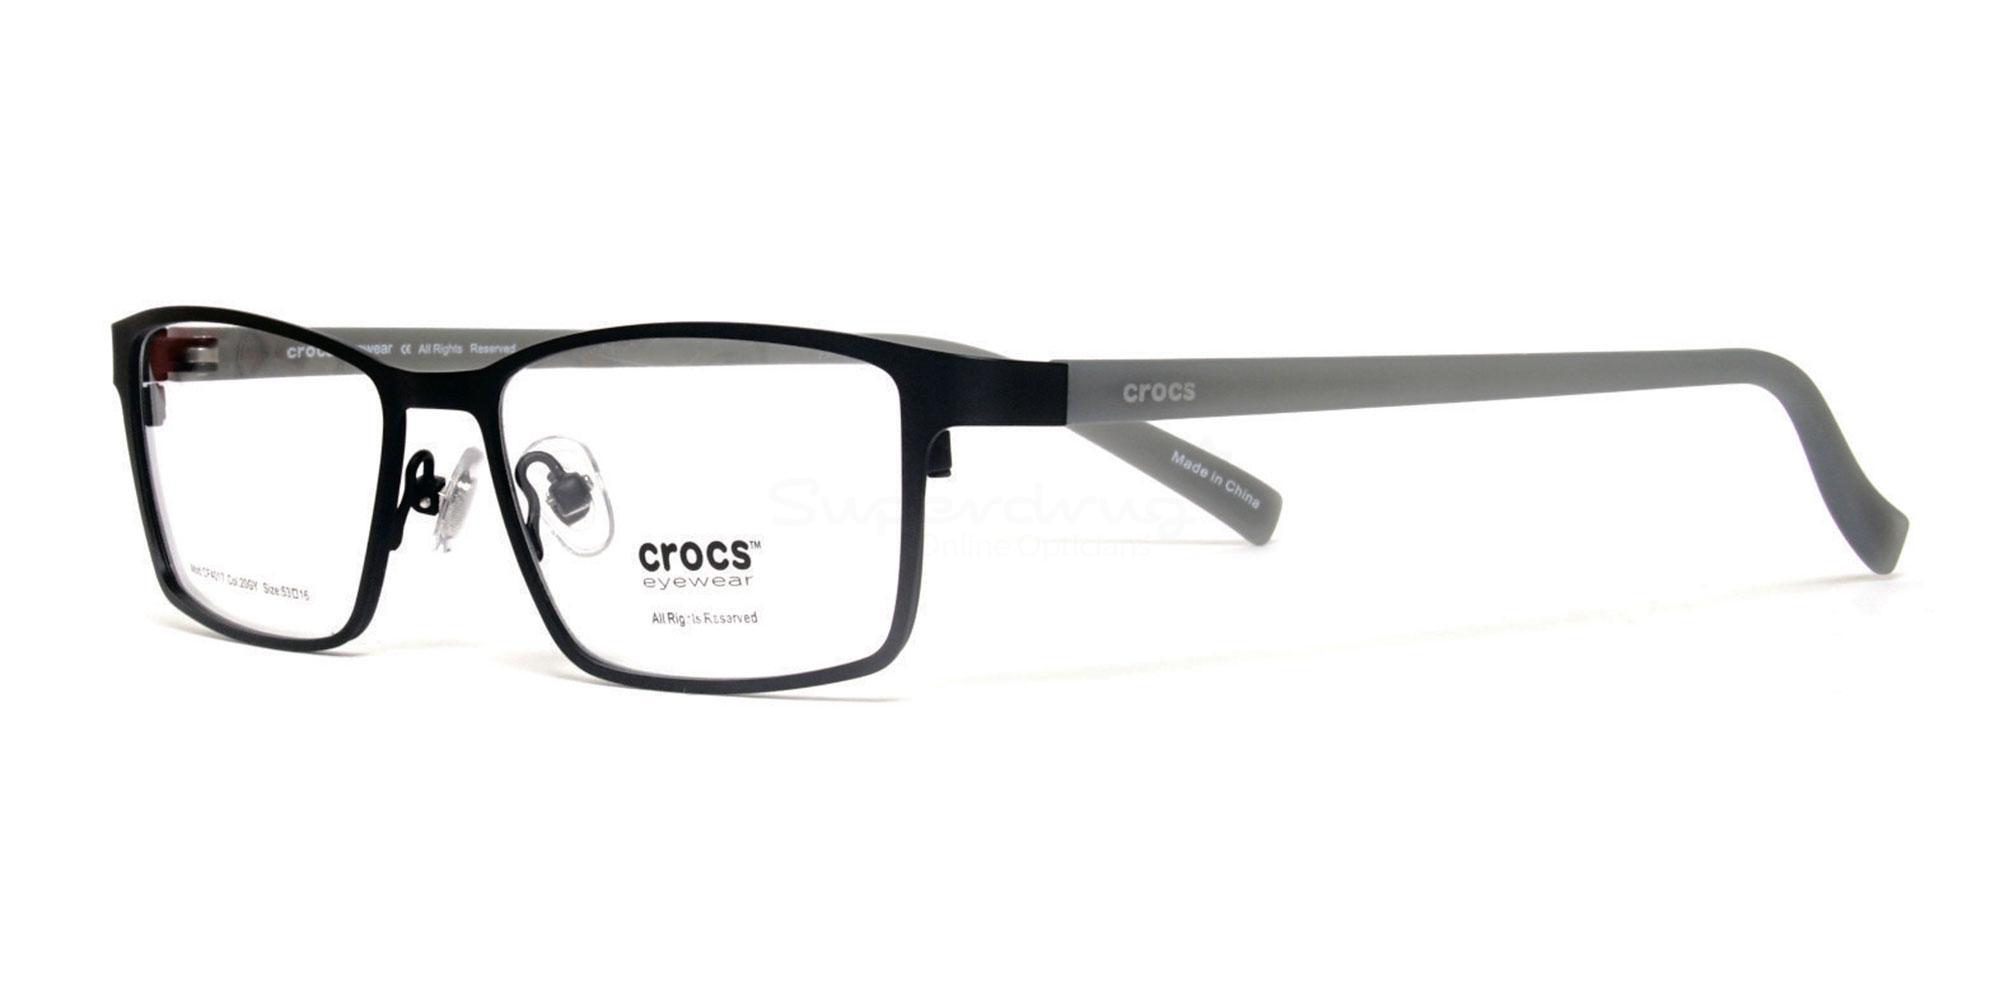 20GY CF4017 Glasses, Crocs Eyewear